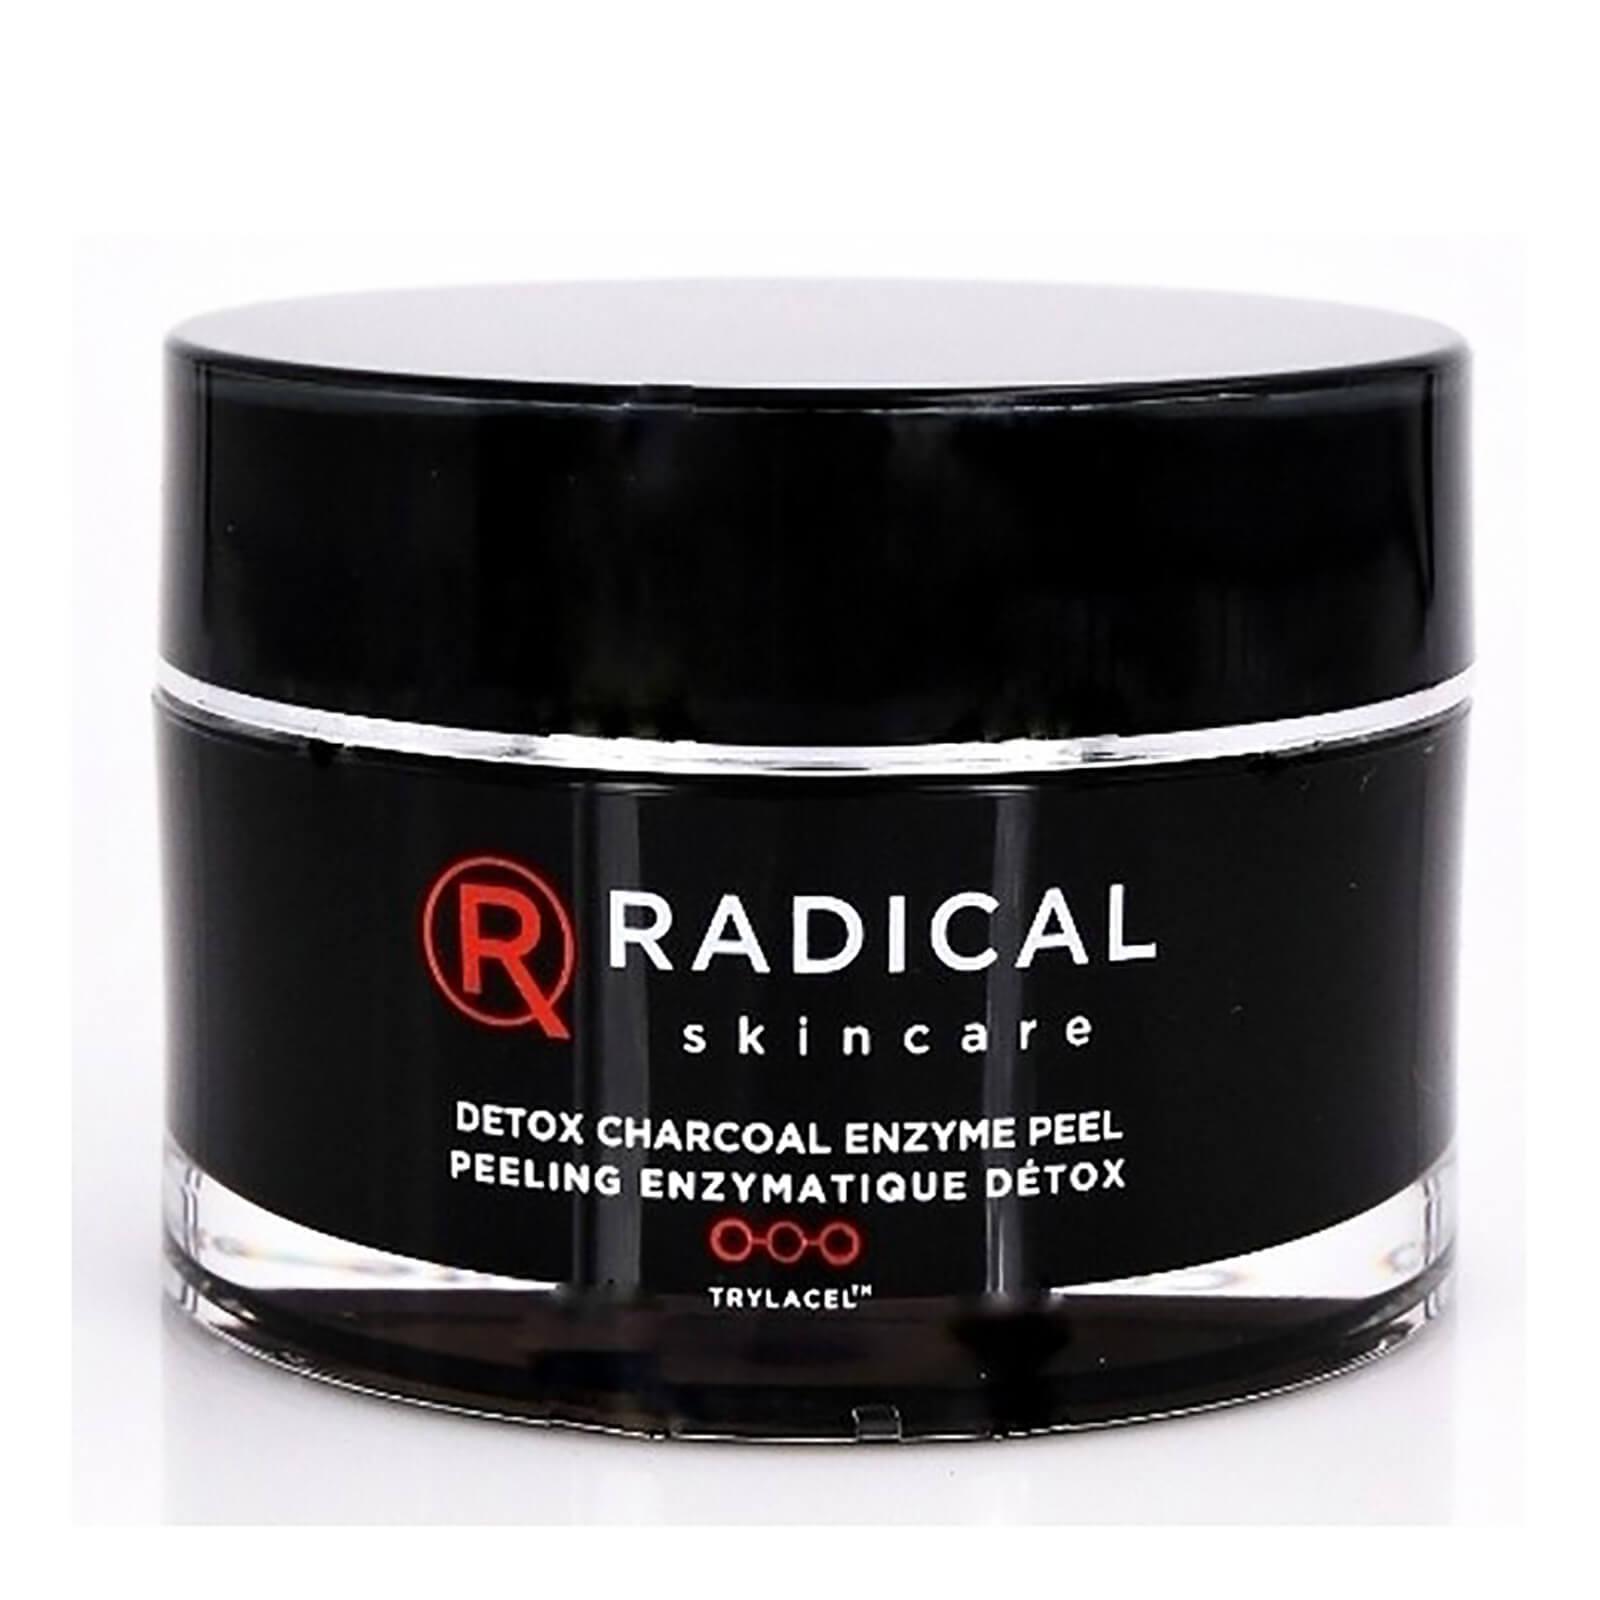 Radical Skincare Detox Charcoal Enzyme Peel 50ml